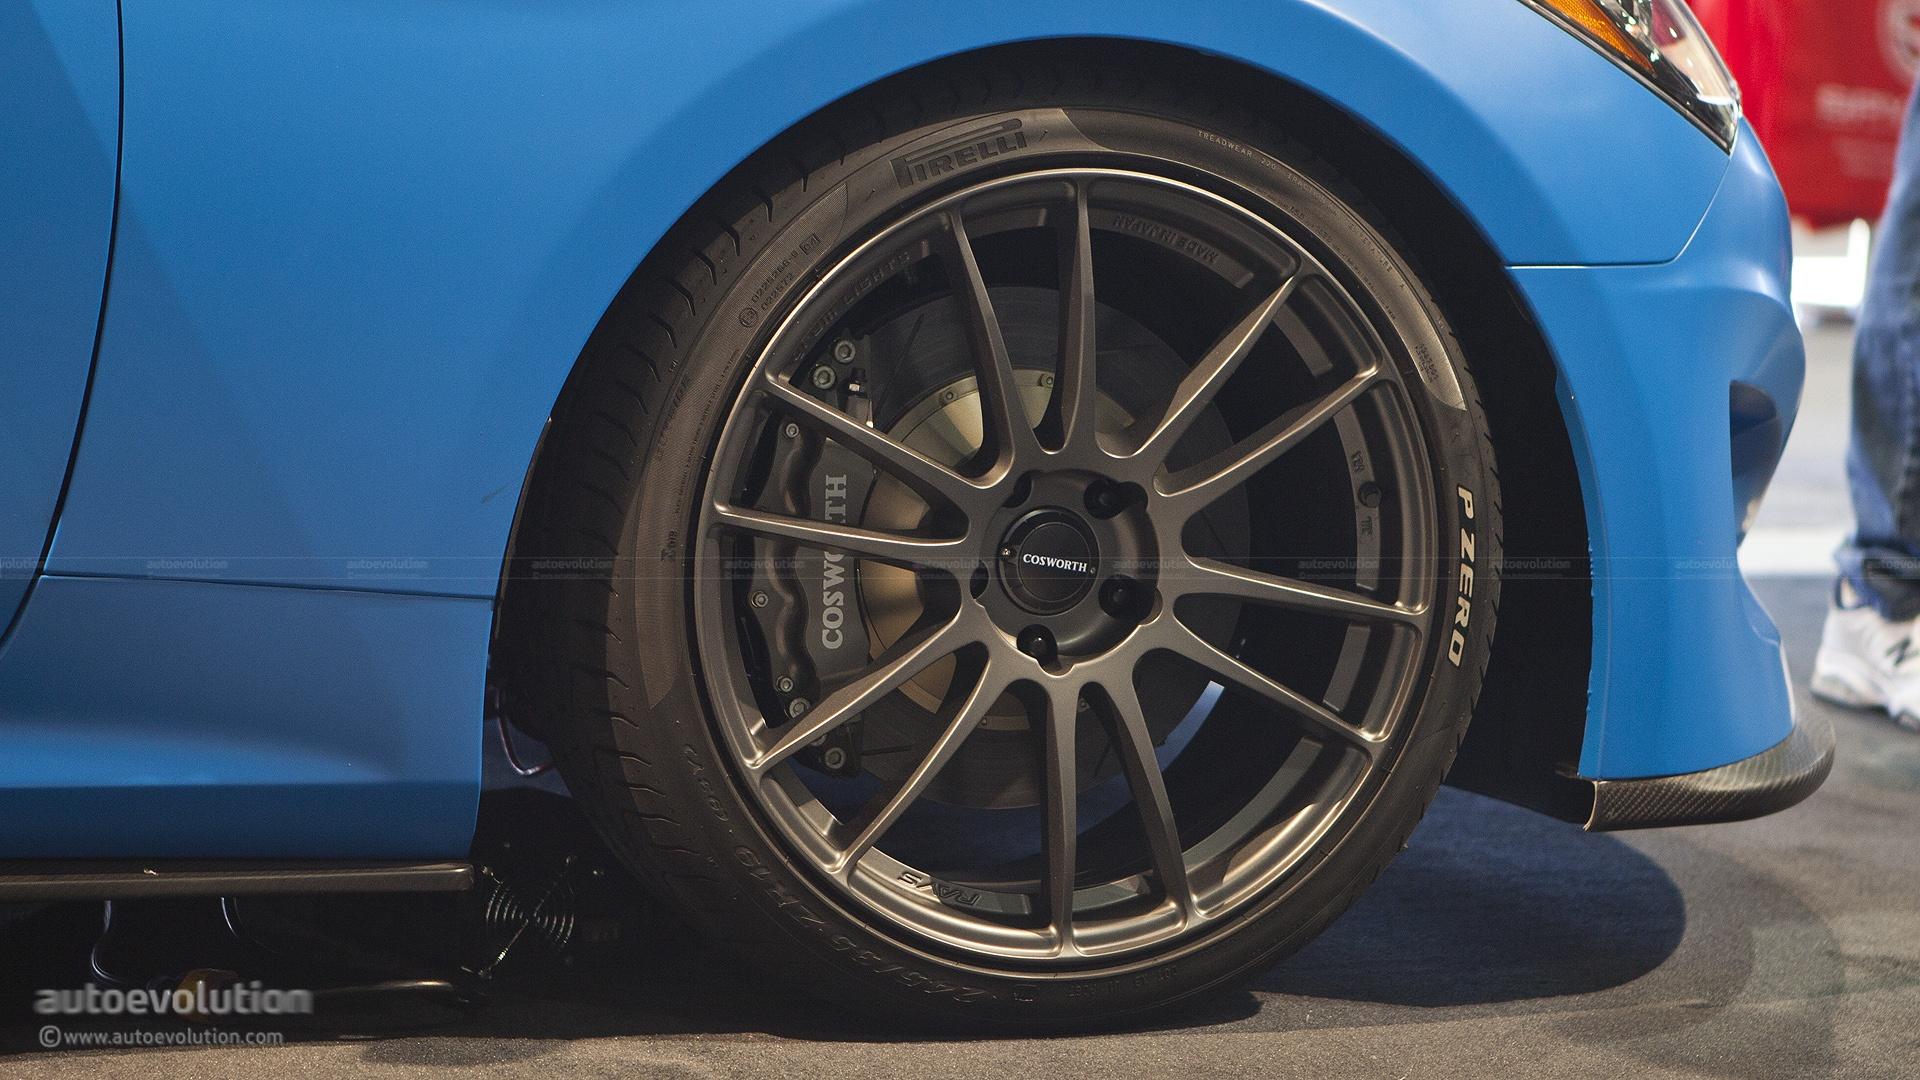 2012 Sema The Cosworth Hyundai Genesis Coupe Racing Live